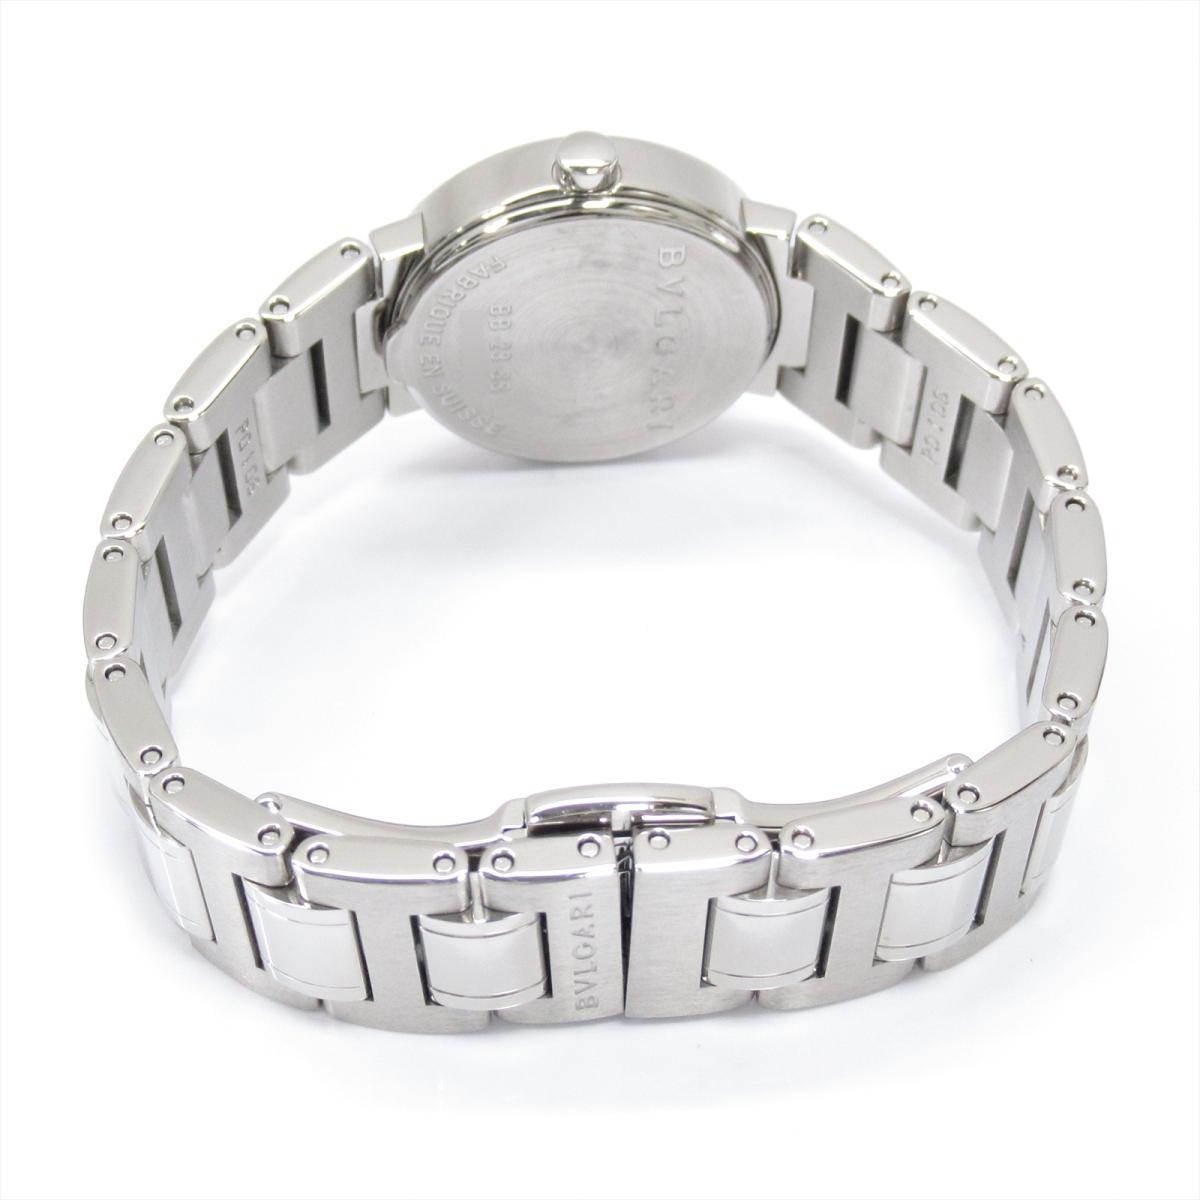 BVLGARI 時計 BB23SS ブルガリ ブルガリ 腕時計/レディース/SALE/お買得品